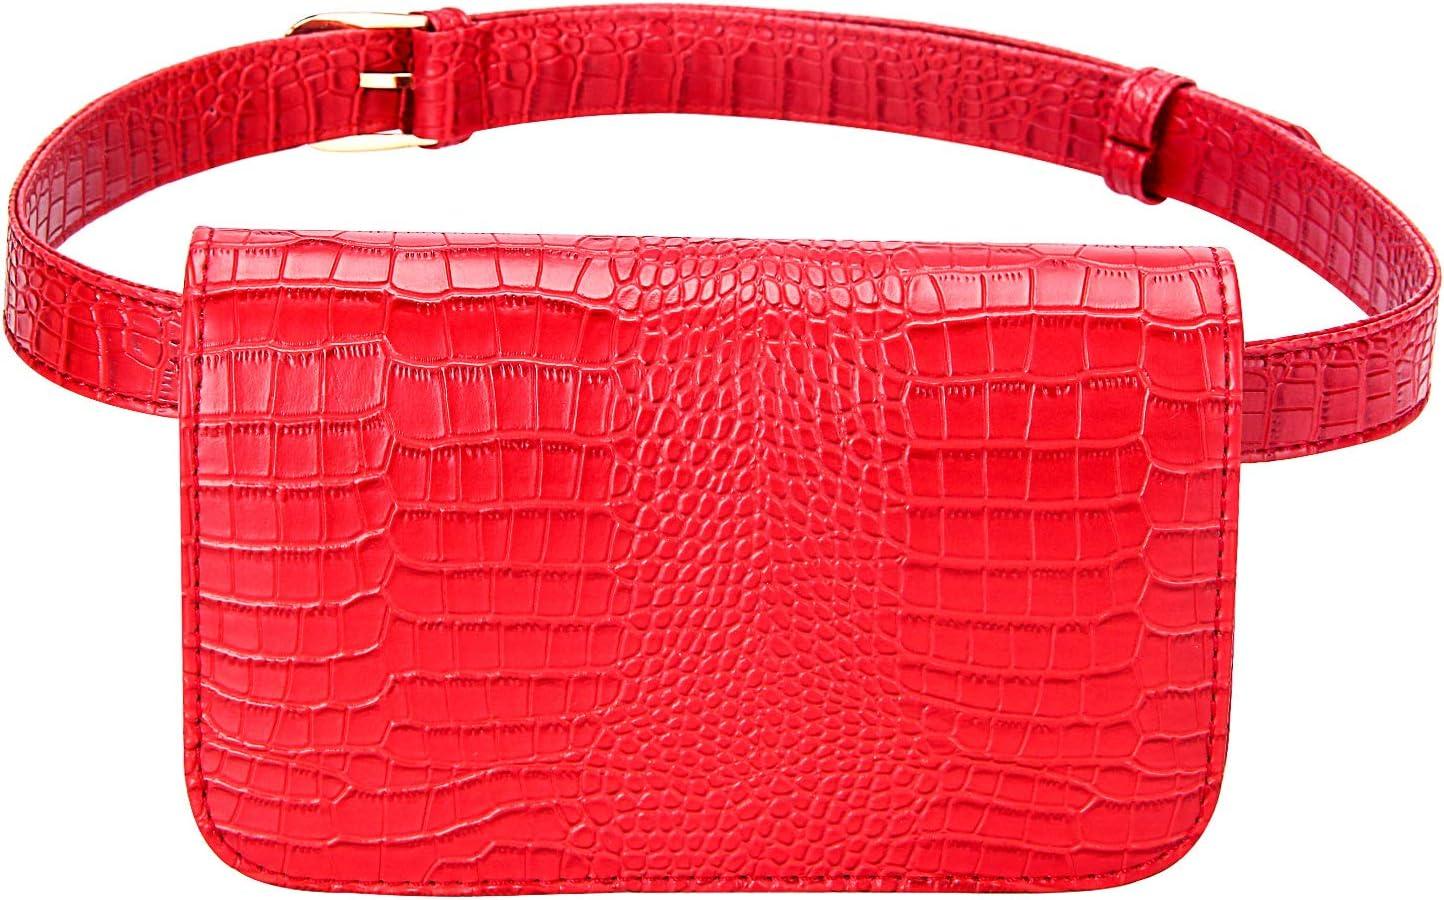 Badiya Women's 5% OFF Mini Waist Bag Leather Cell Packs Fanny Crocodile lowest price